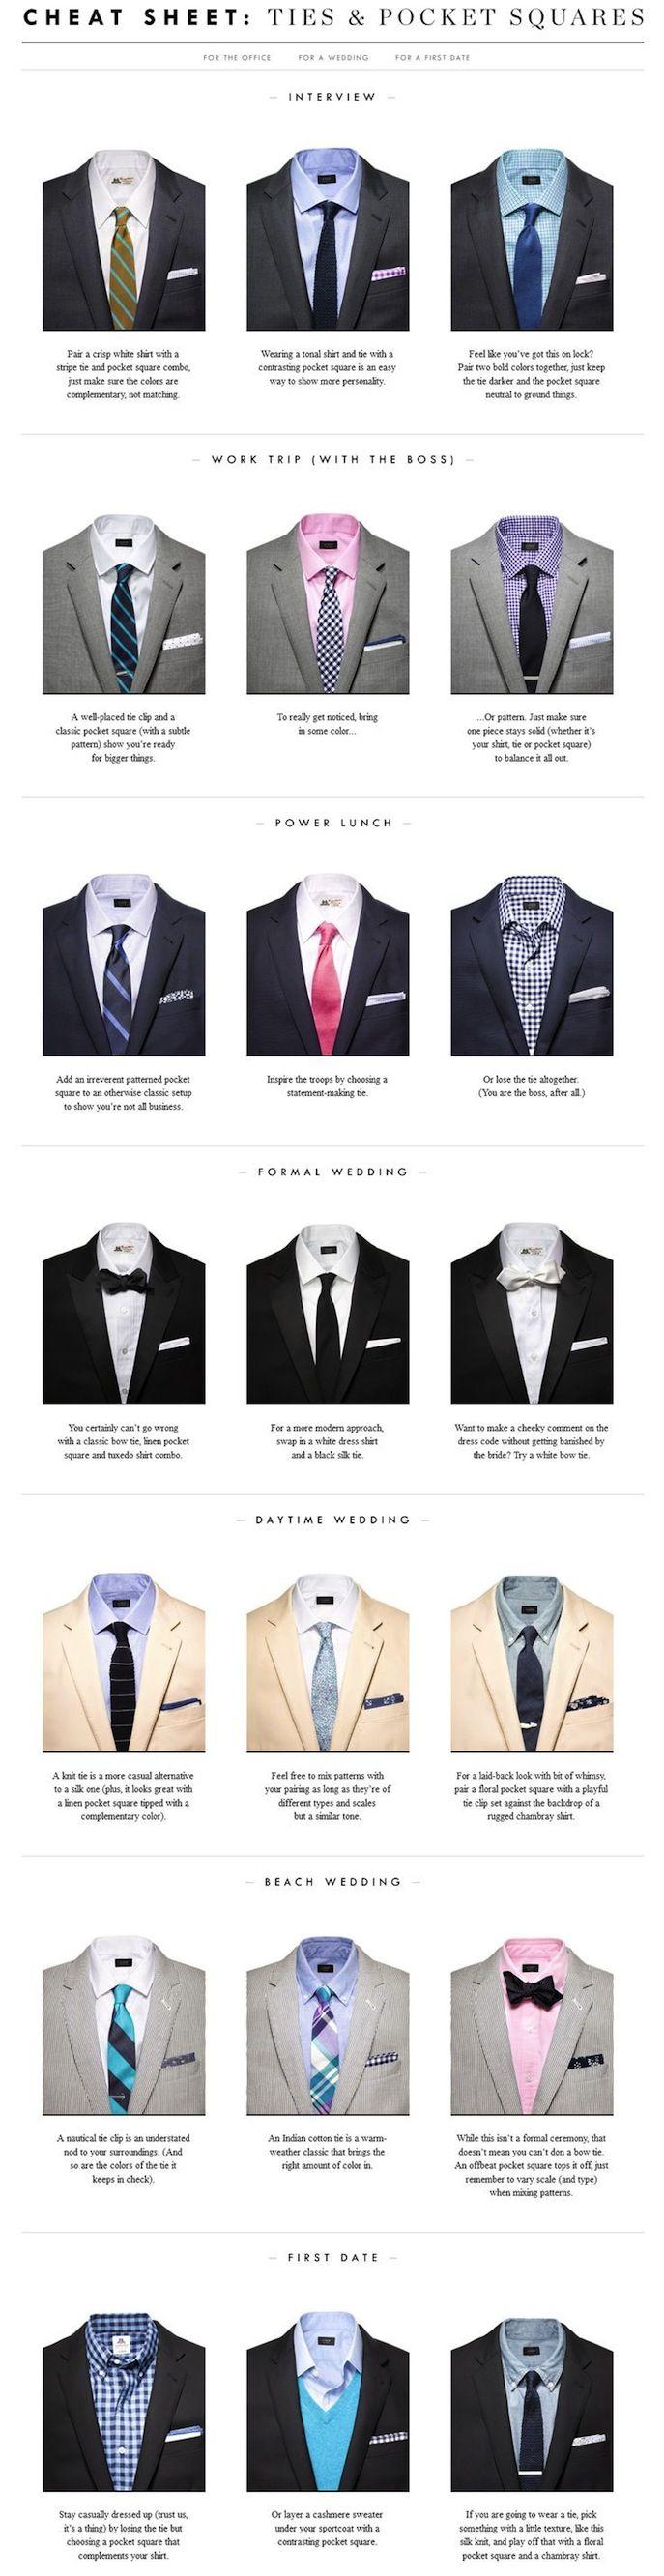 Cheat Sheet Ties Pocket Squares Style Guide Estilos De Moda